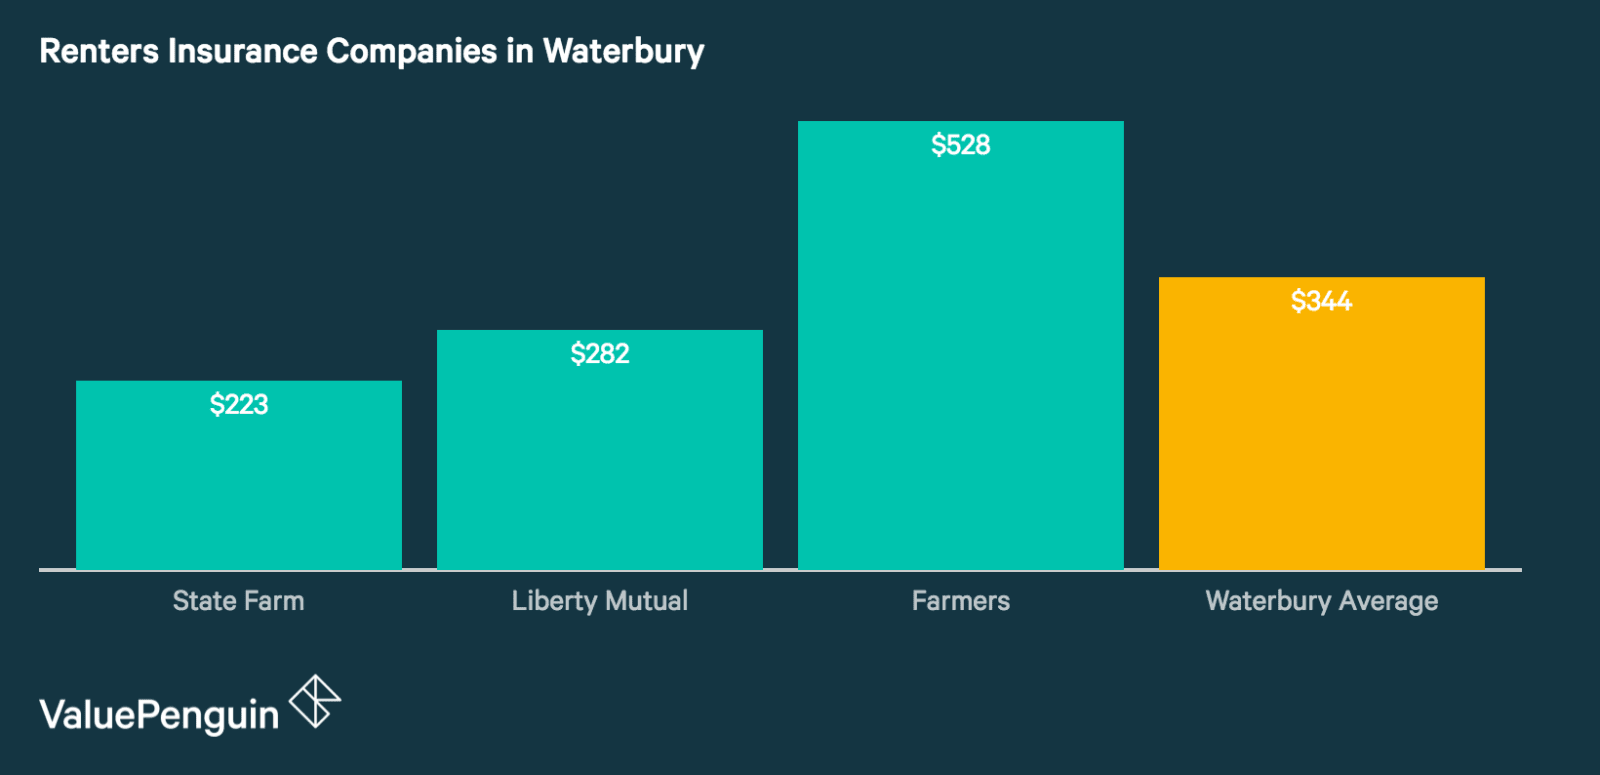 Renters Insurance Rates in Waterbury